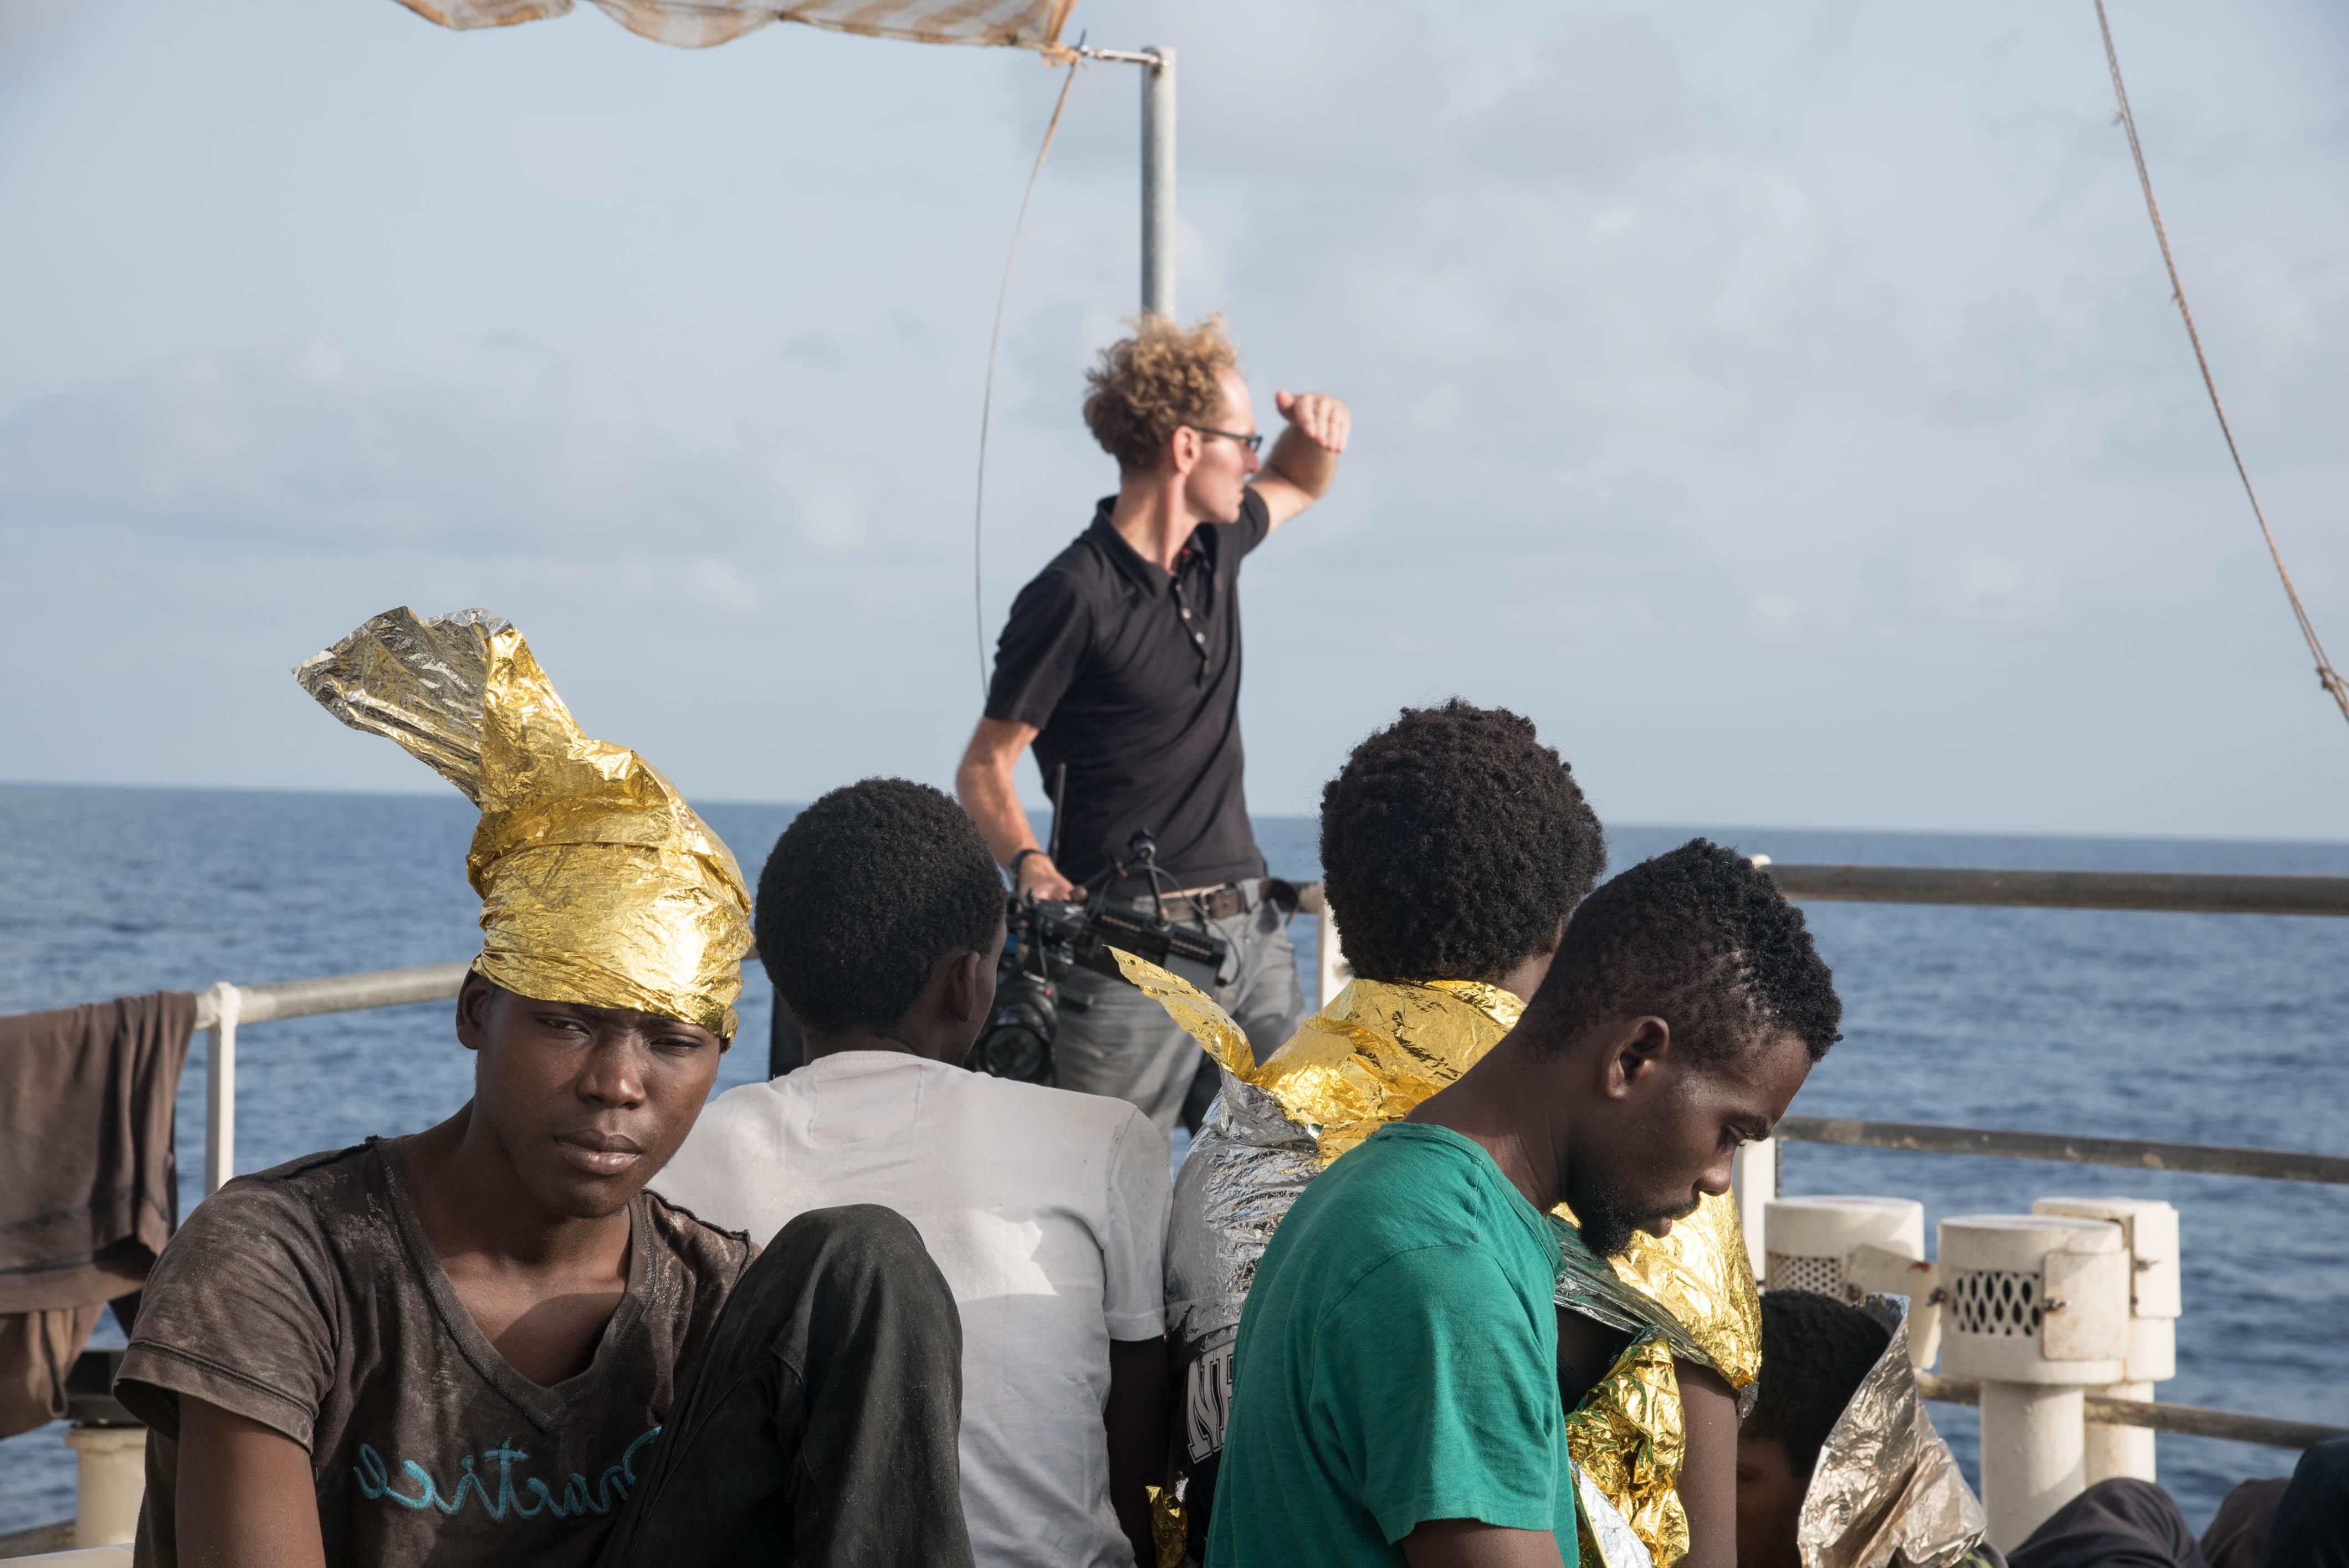 Skye Fitzgerald filming Search & Rescue in the Mediterranean.